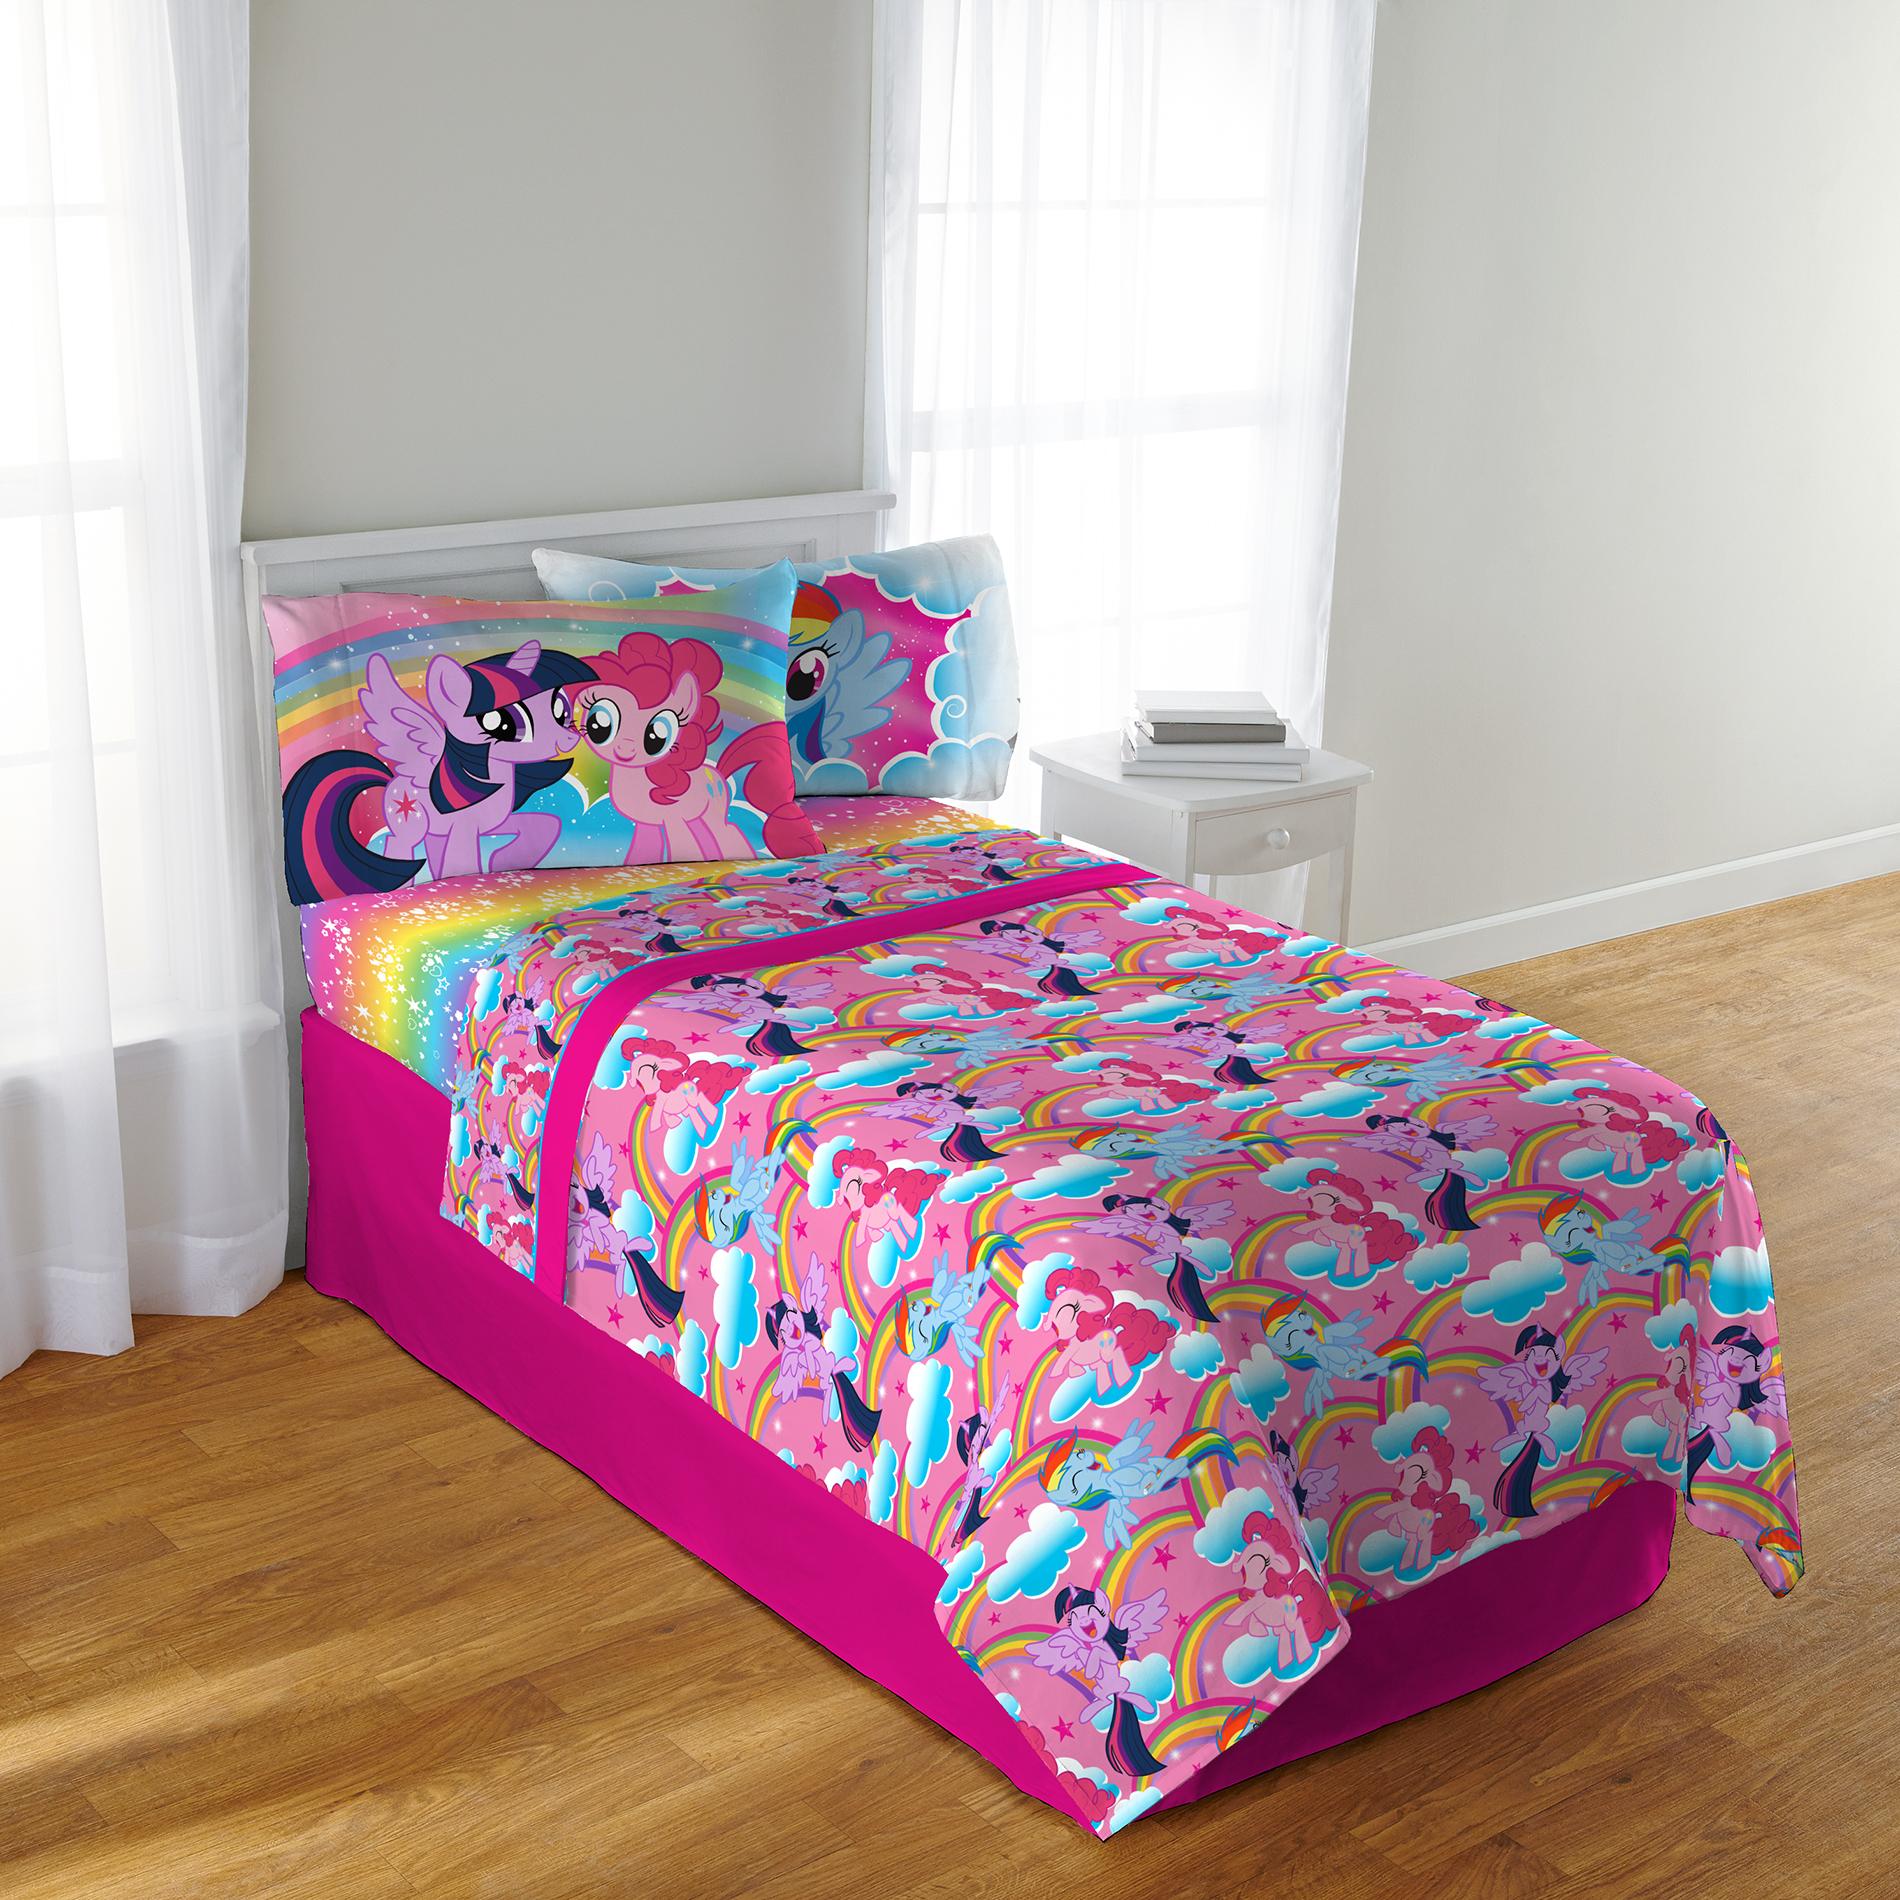 Hasbro Little Pony Living Dream Sheet Set - Multicolored